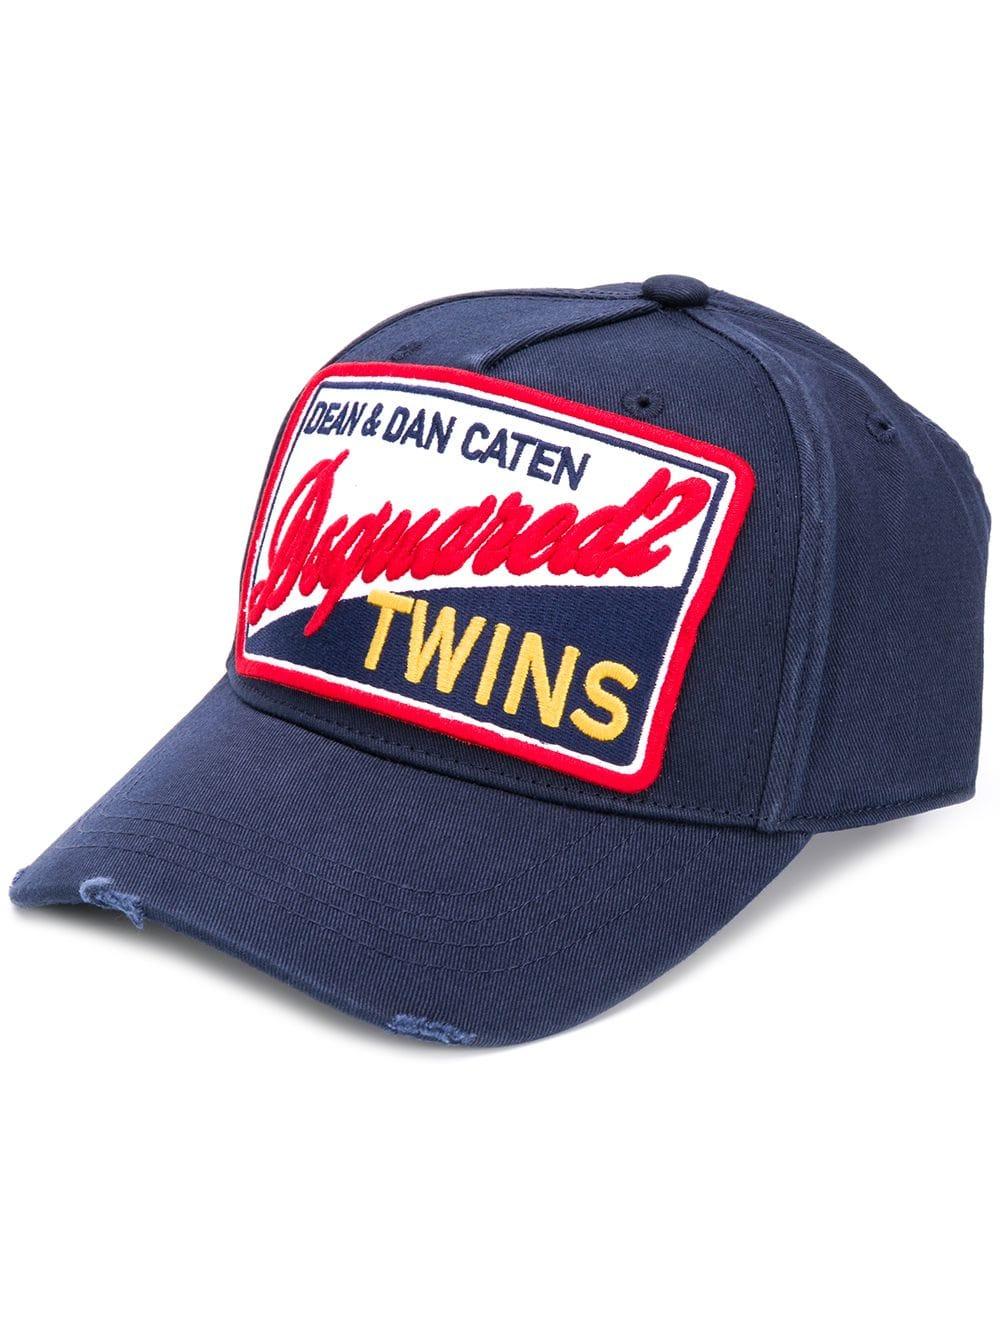 7bba8cb0d0c97 D2 Baseball Cap - DSQUARED2 - Russocapri